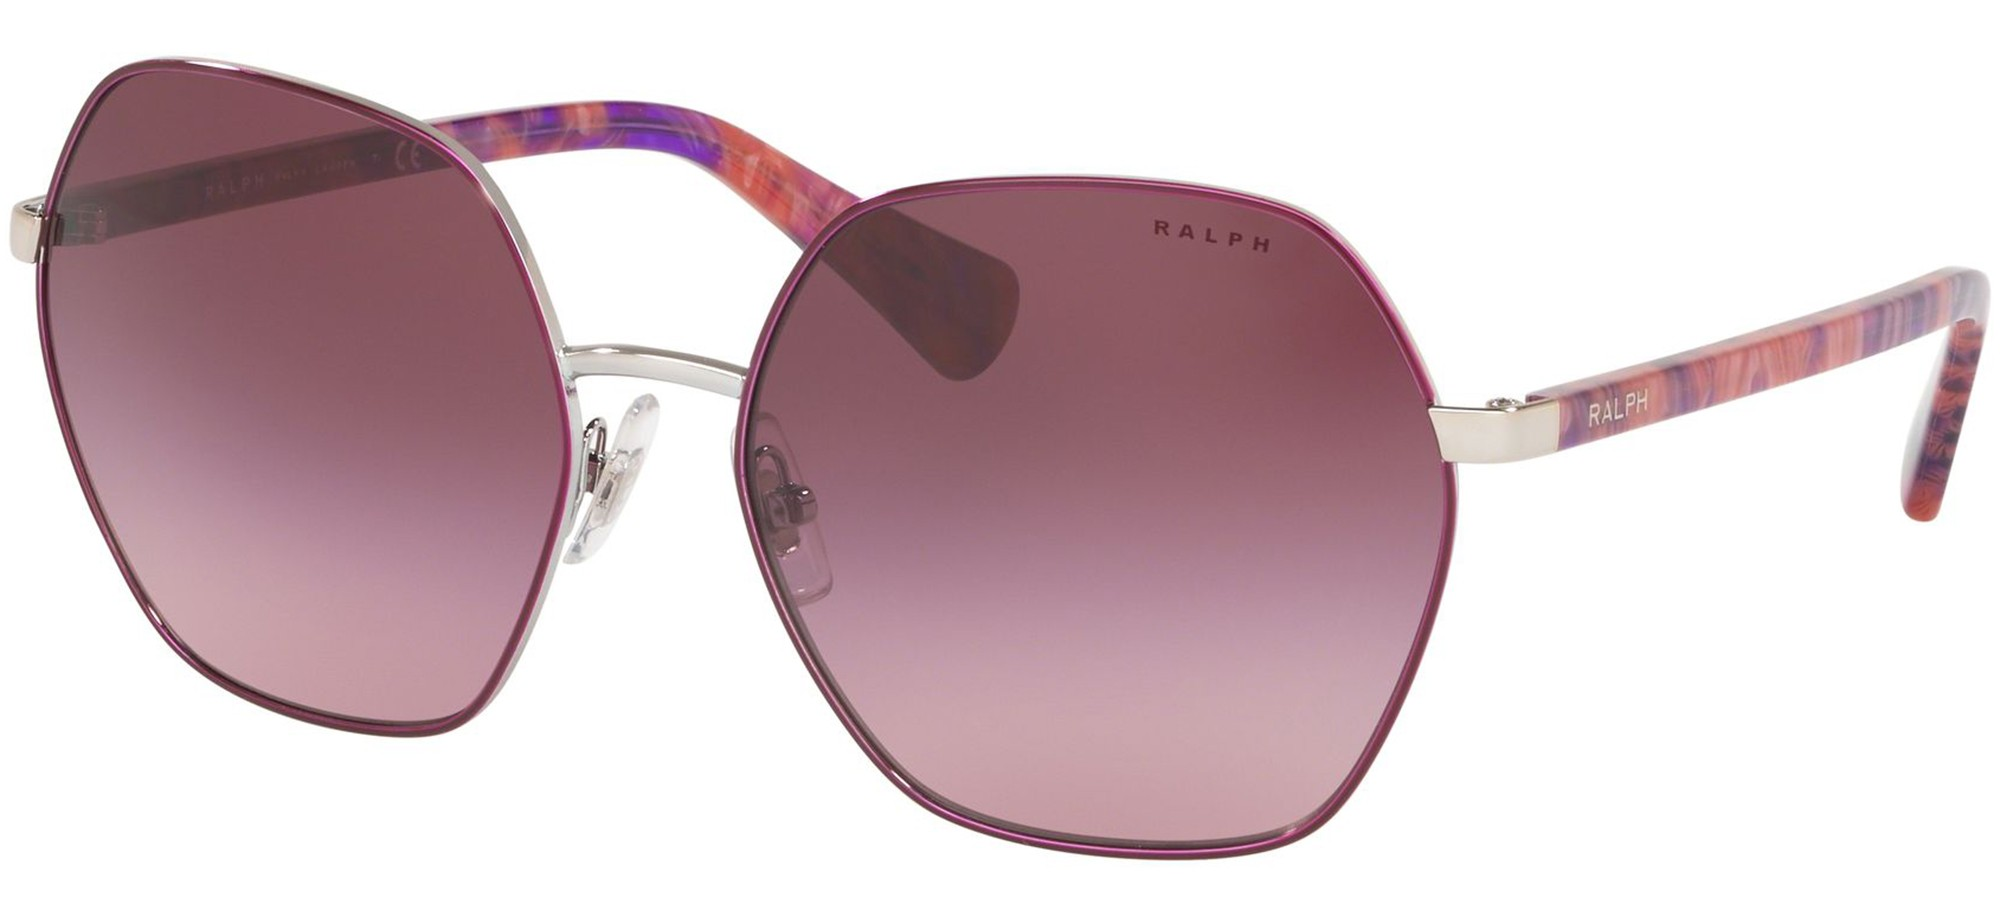 Ralph sunglasses RA 4124